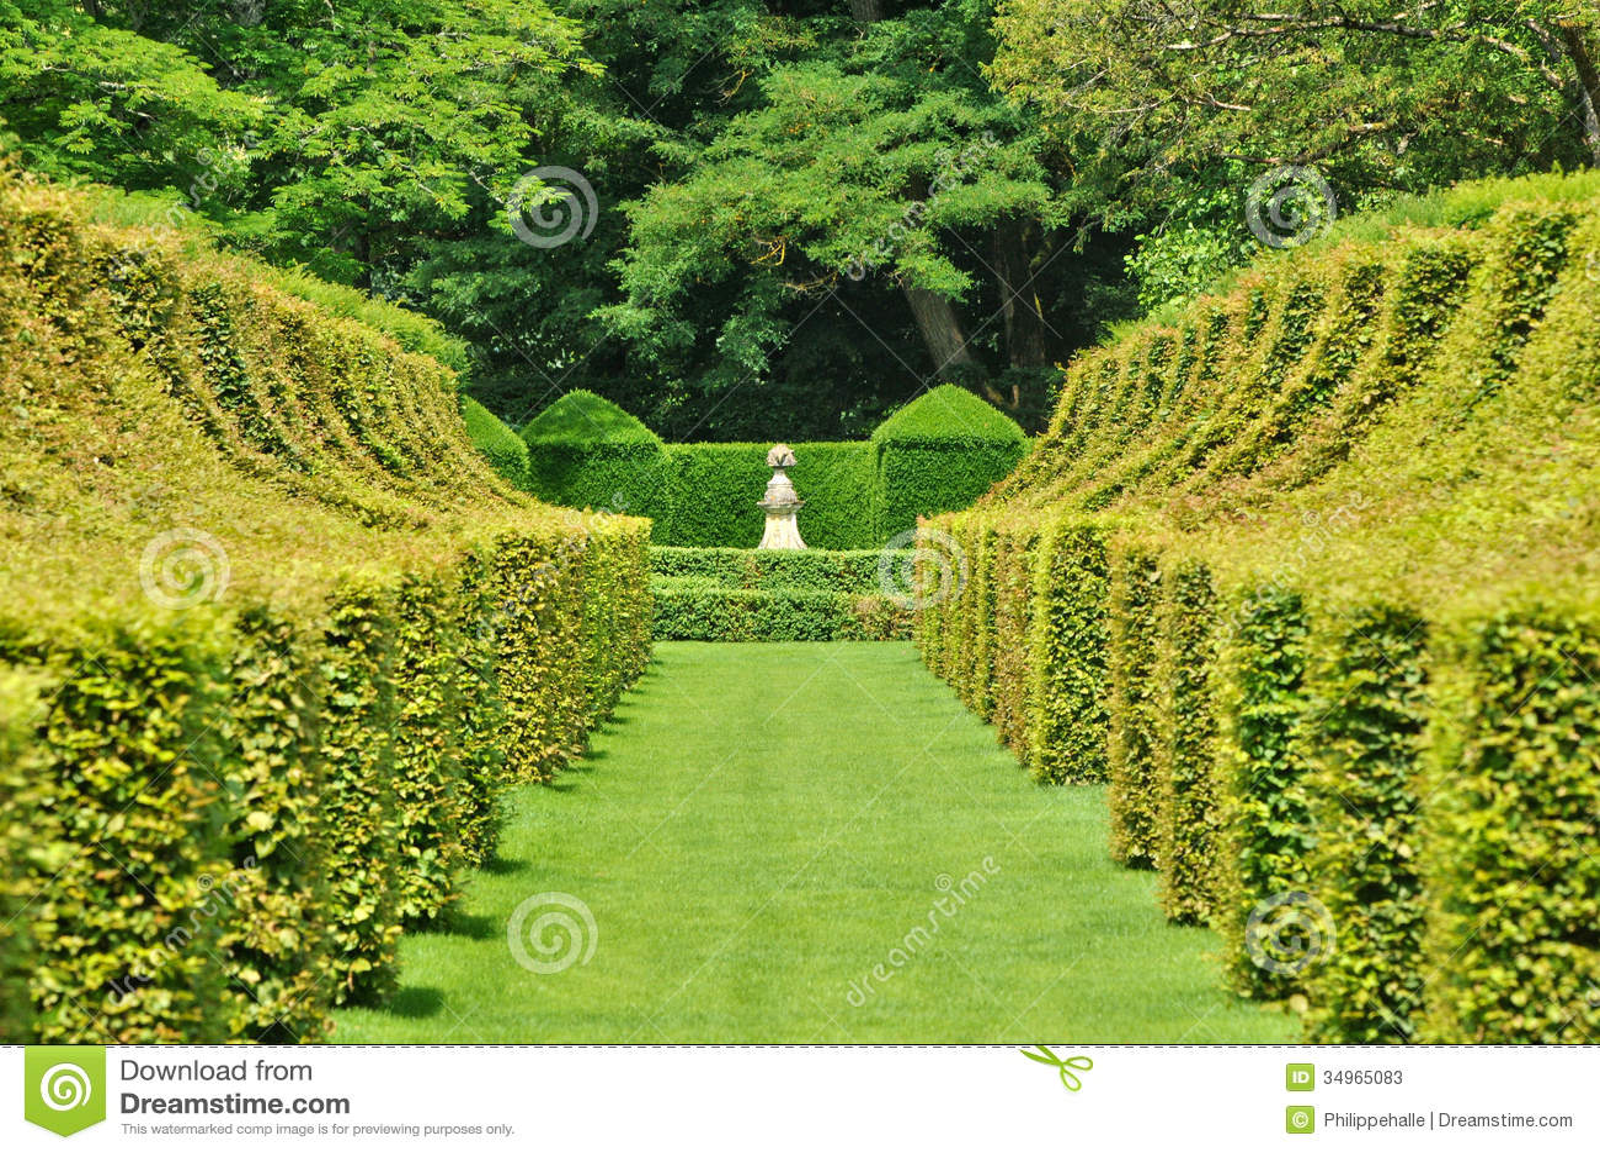 France picturesque jardins du manoir d eyrignac in dordogne stock photos image 34965083 - Jardins du manoir d eyrignac ...